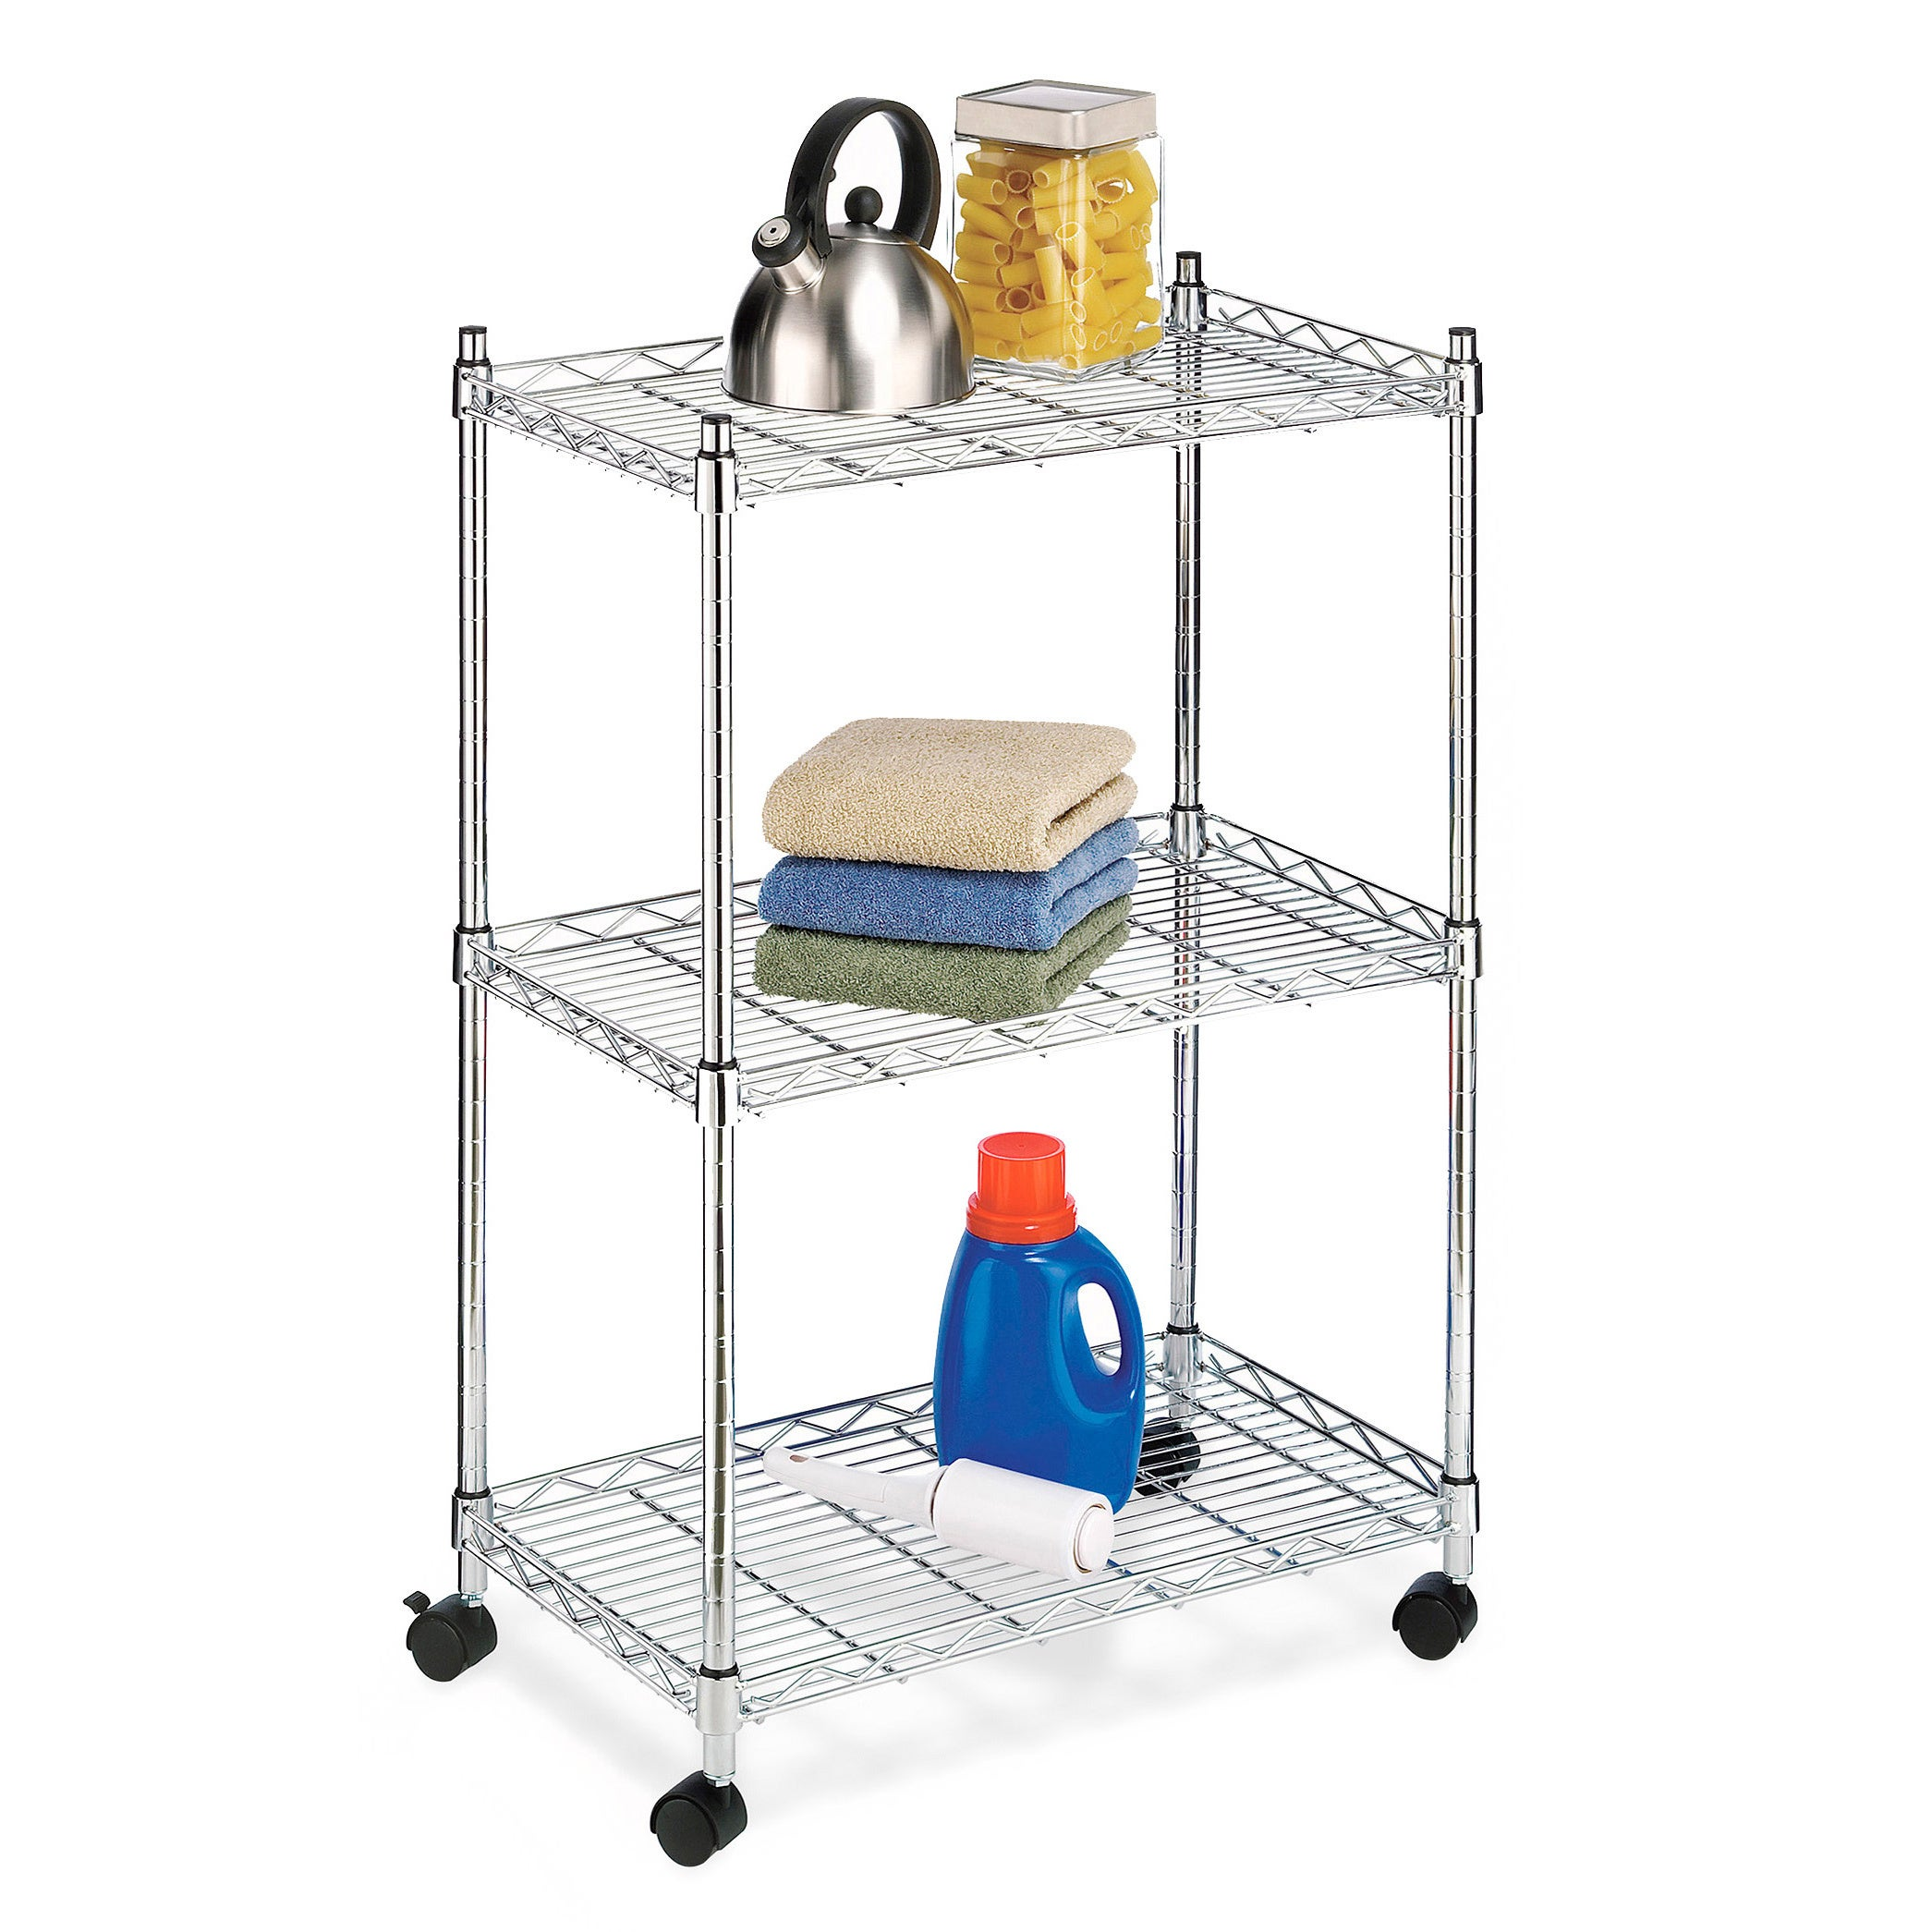 shop whitmor rolling utility cart free shipping today overstockcom 7997317 - Rolling Utility Cart